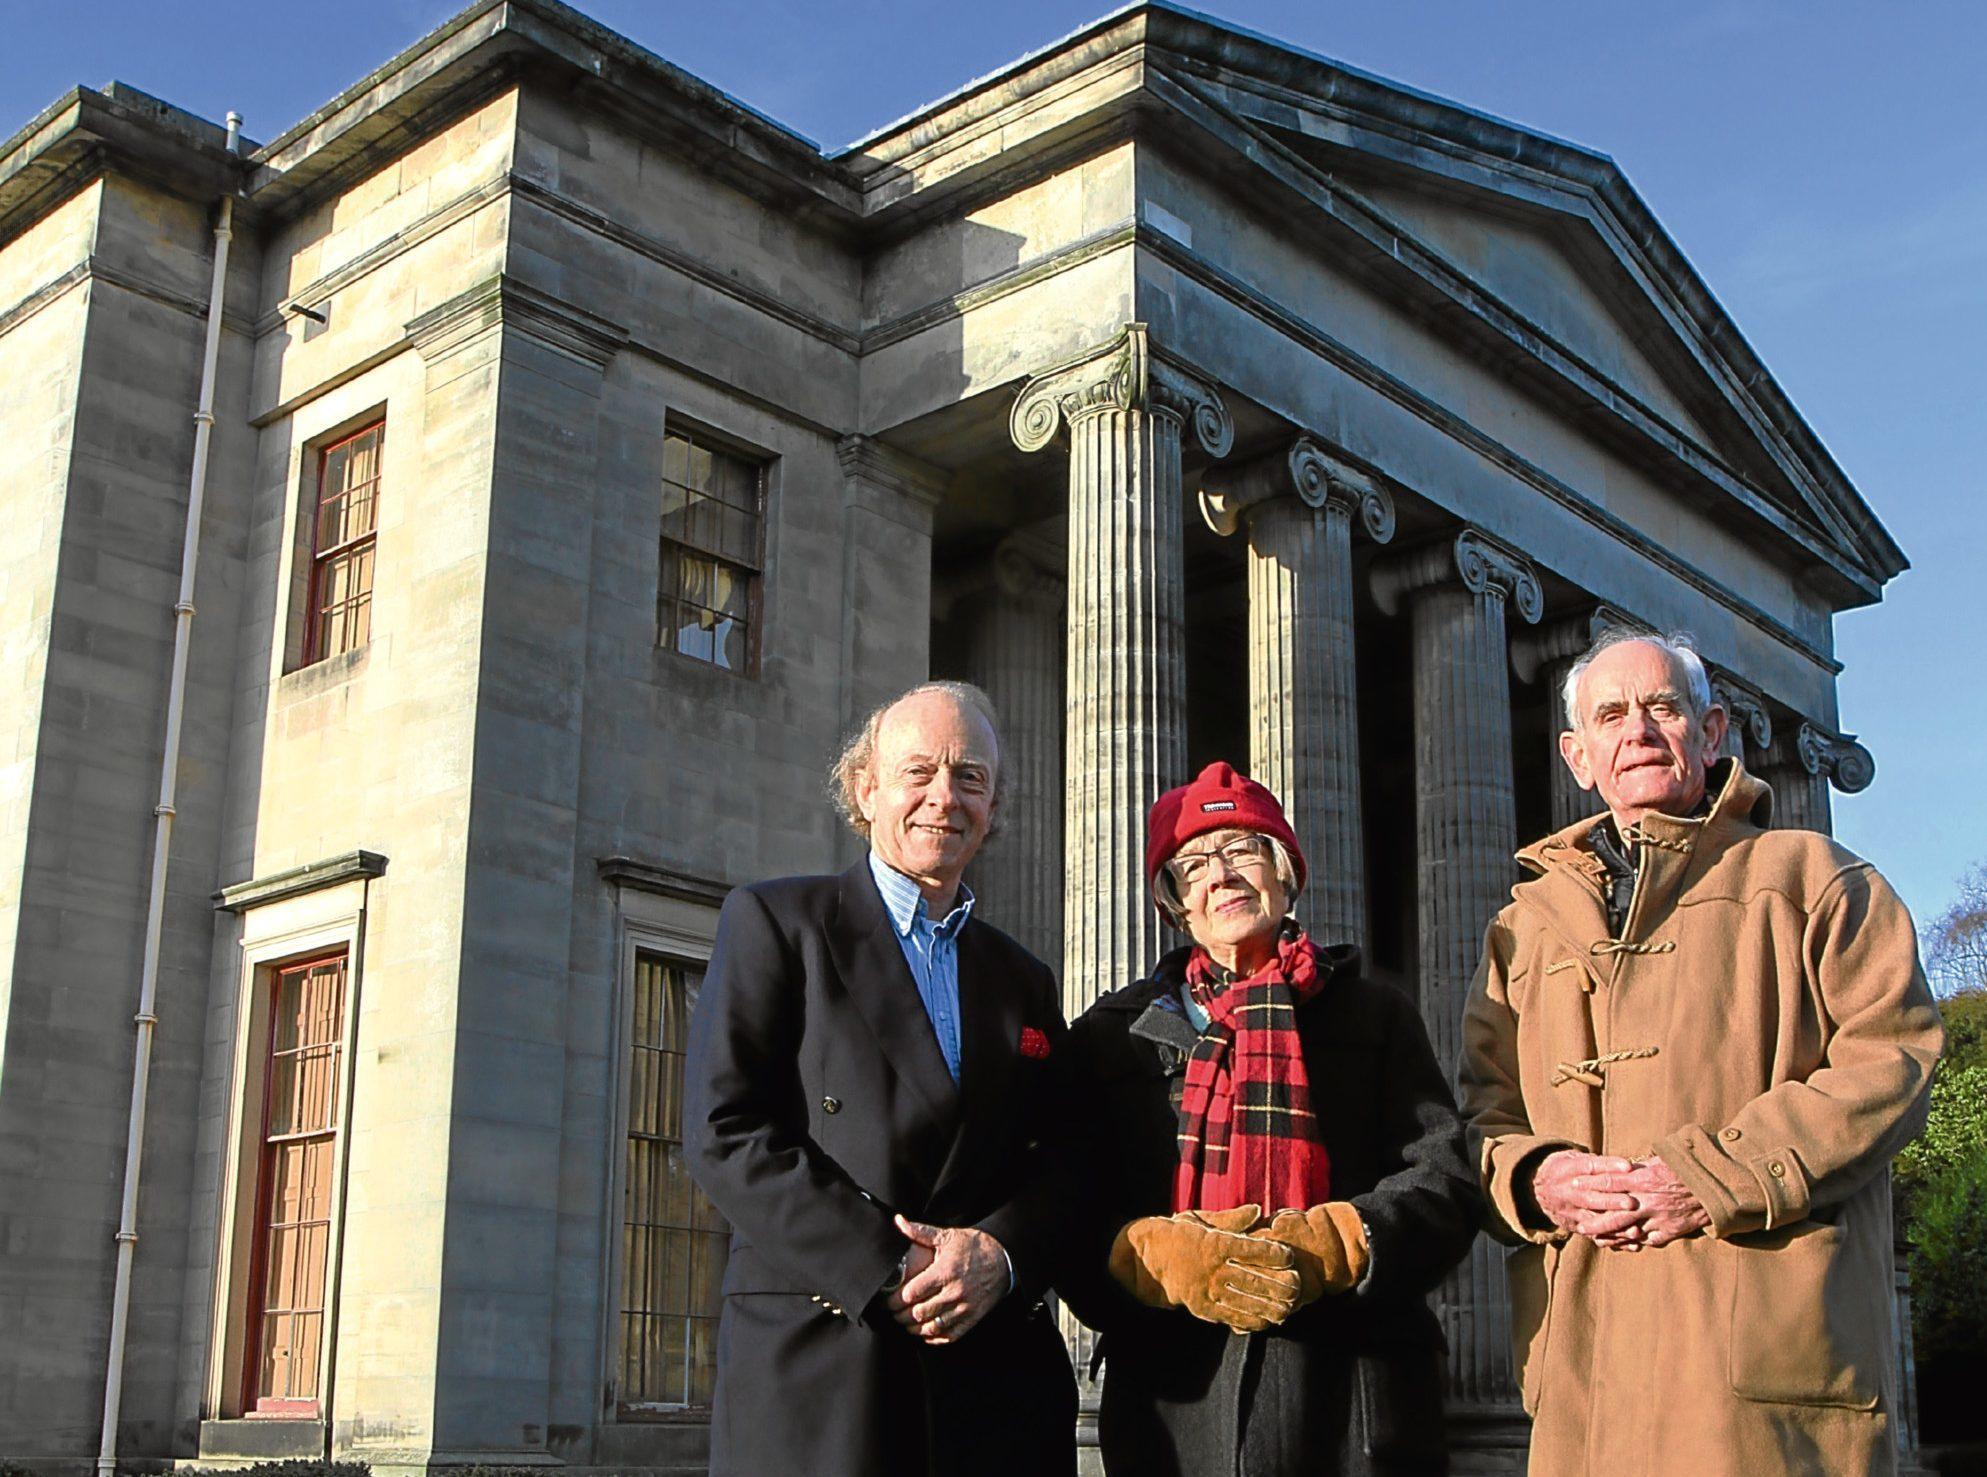 Captain James Crawford, Elizabeth Picton and Commander John Picton in front of Camperdown House.